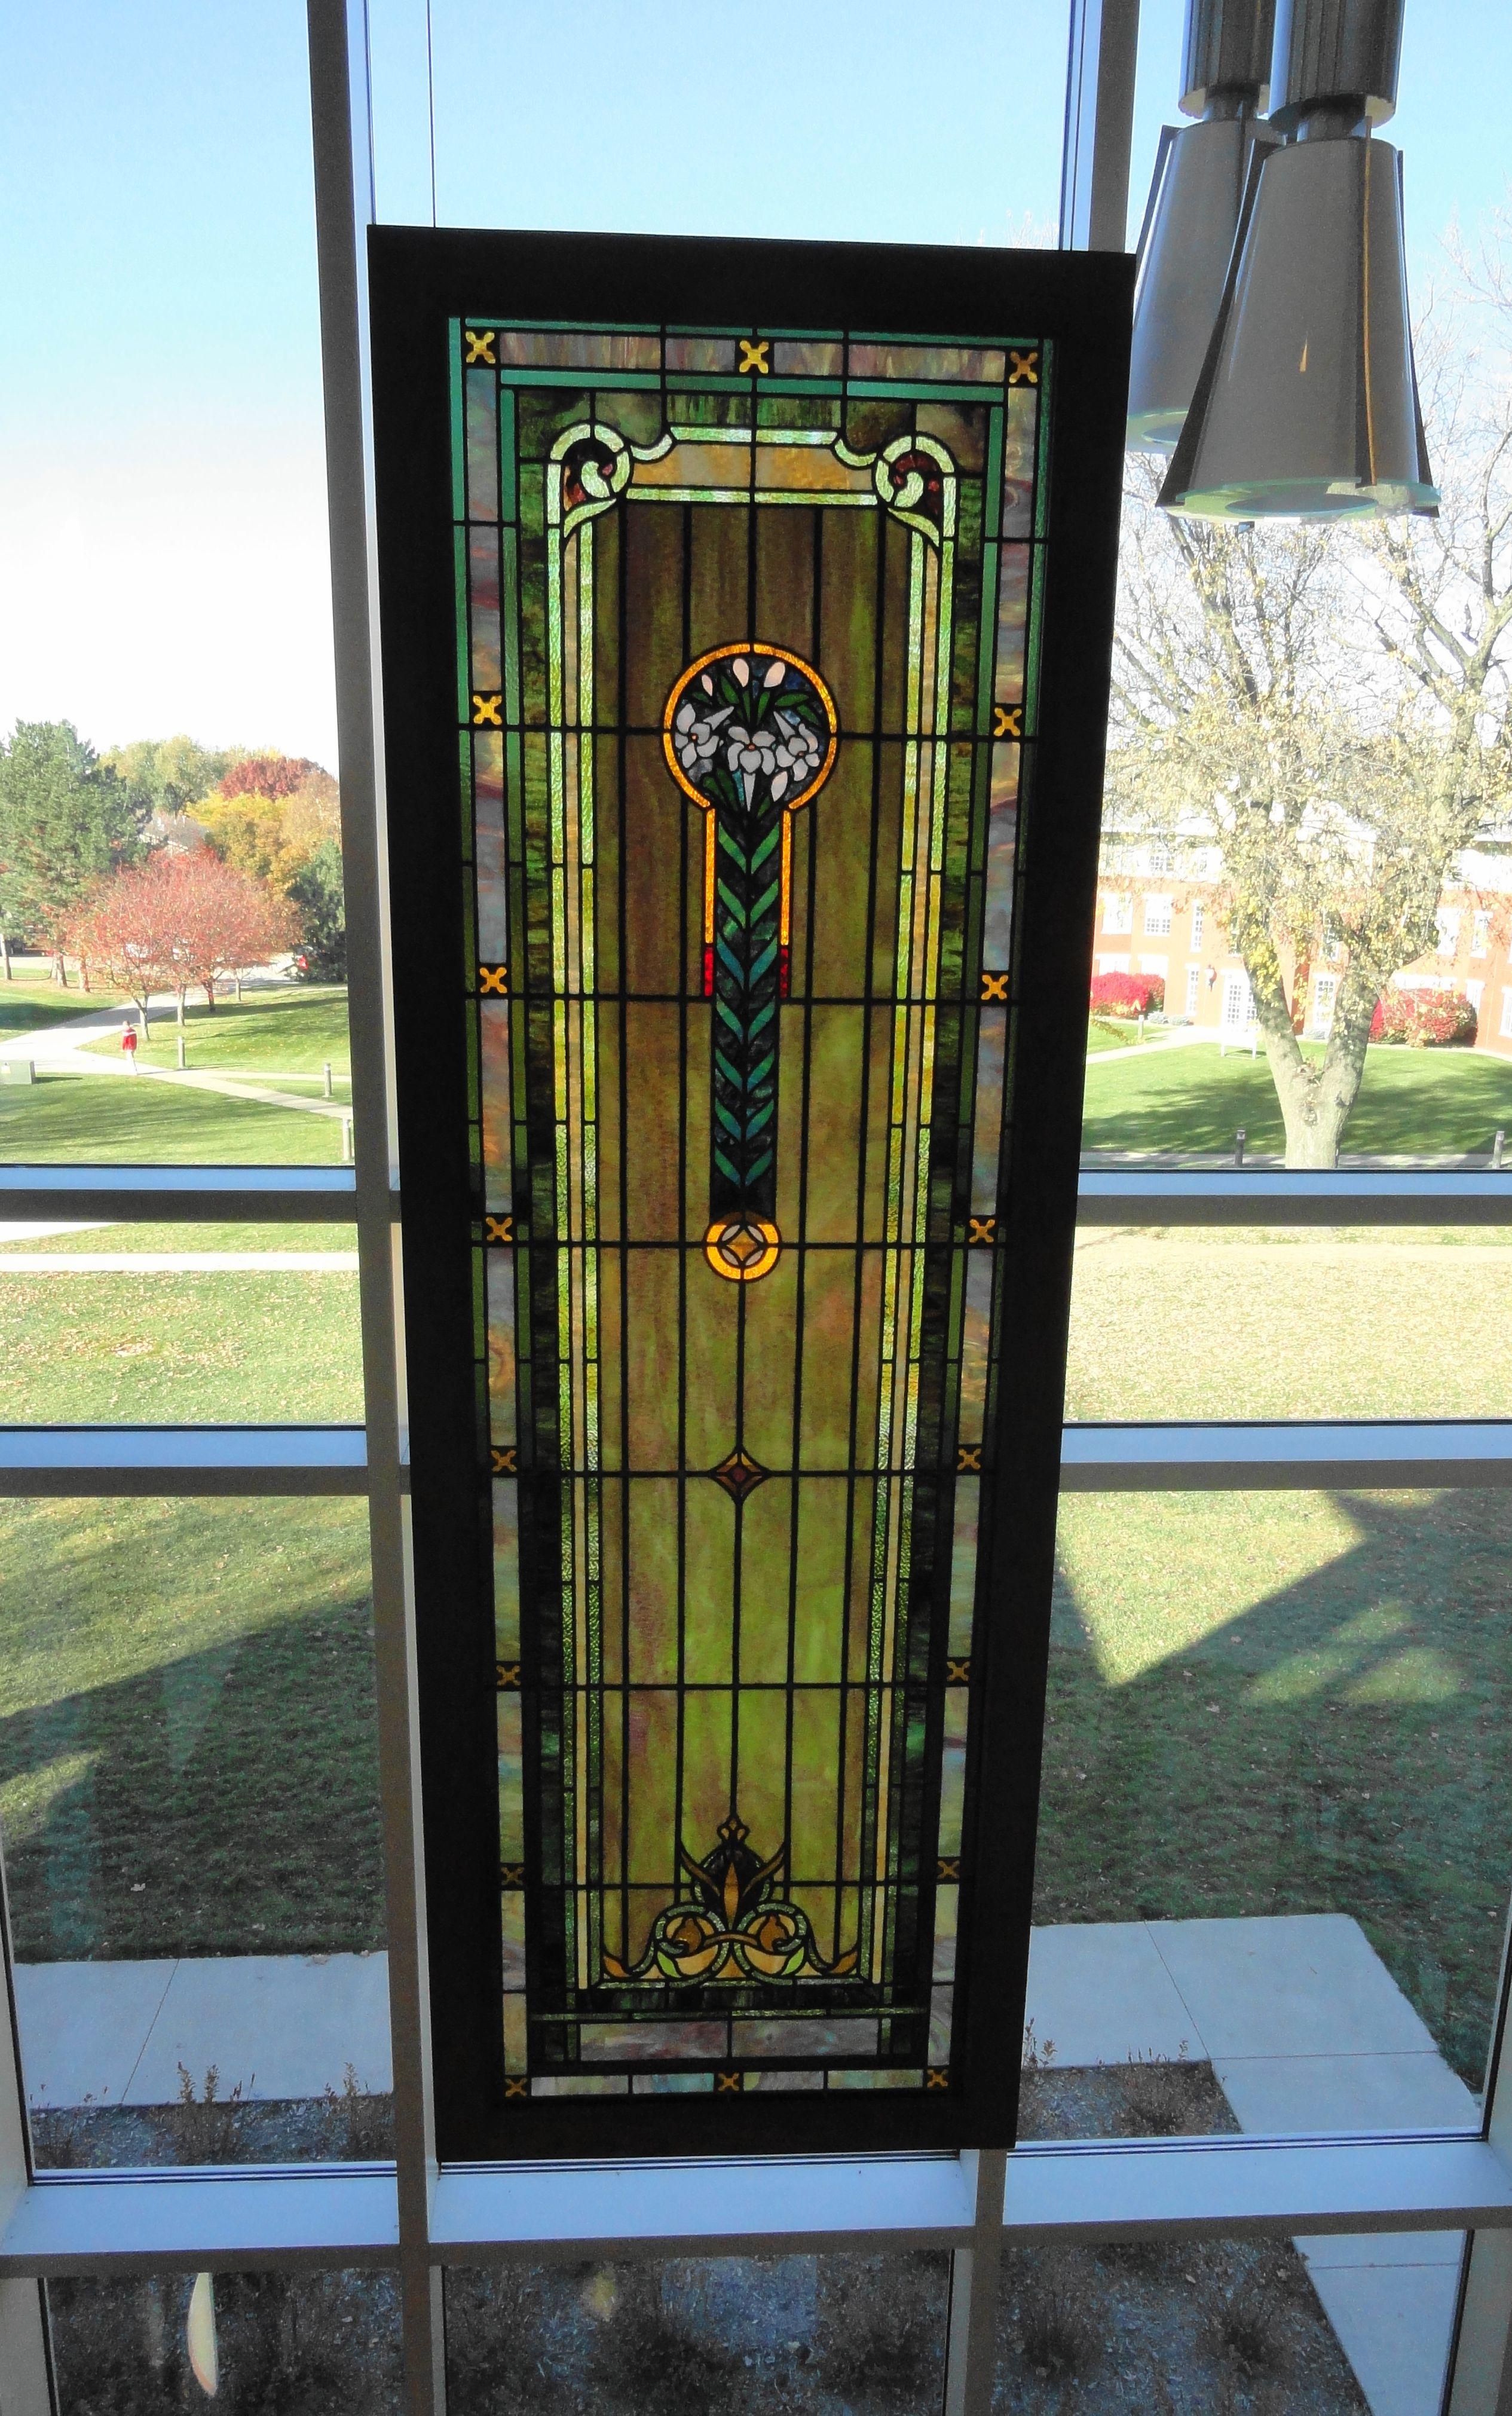 Stain glass window inside new library. Northwestern